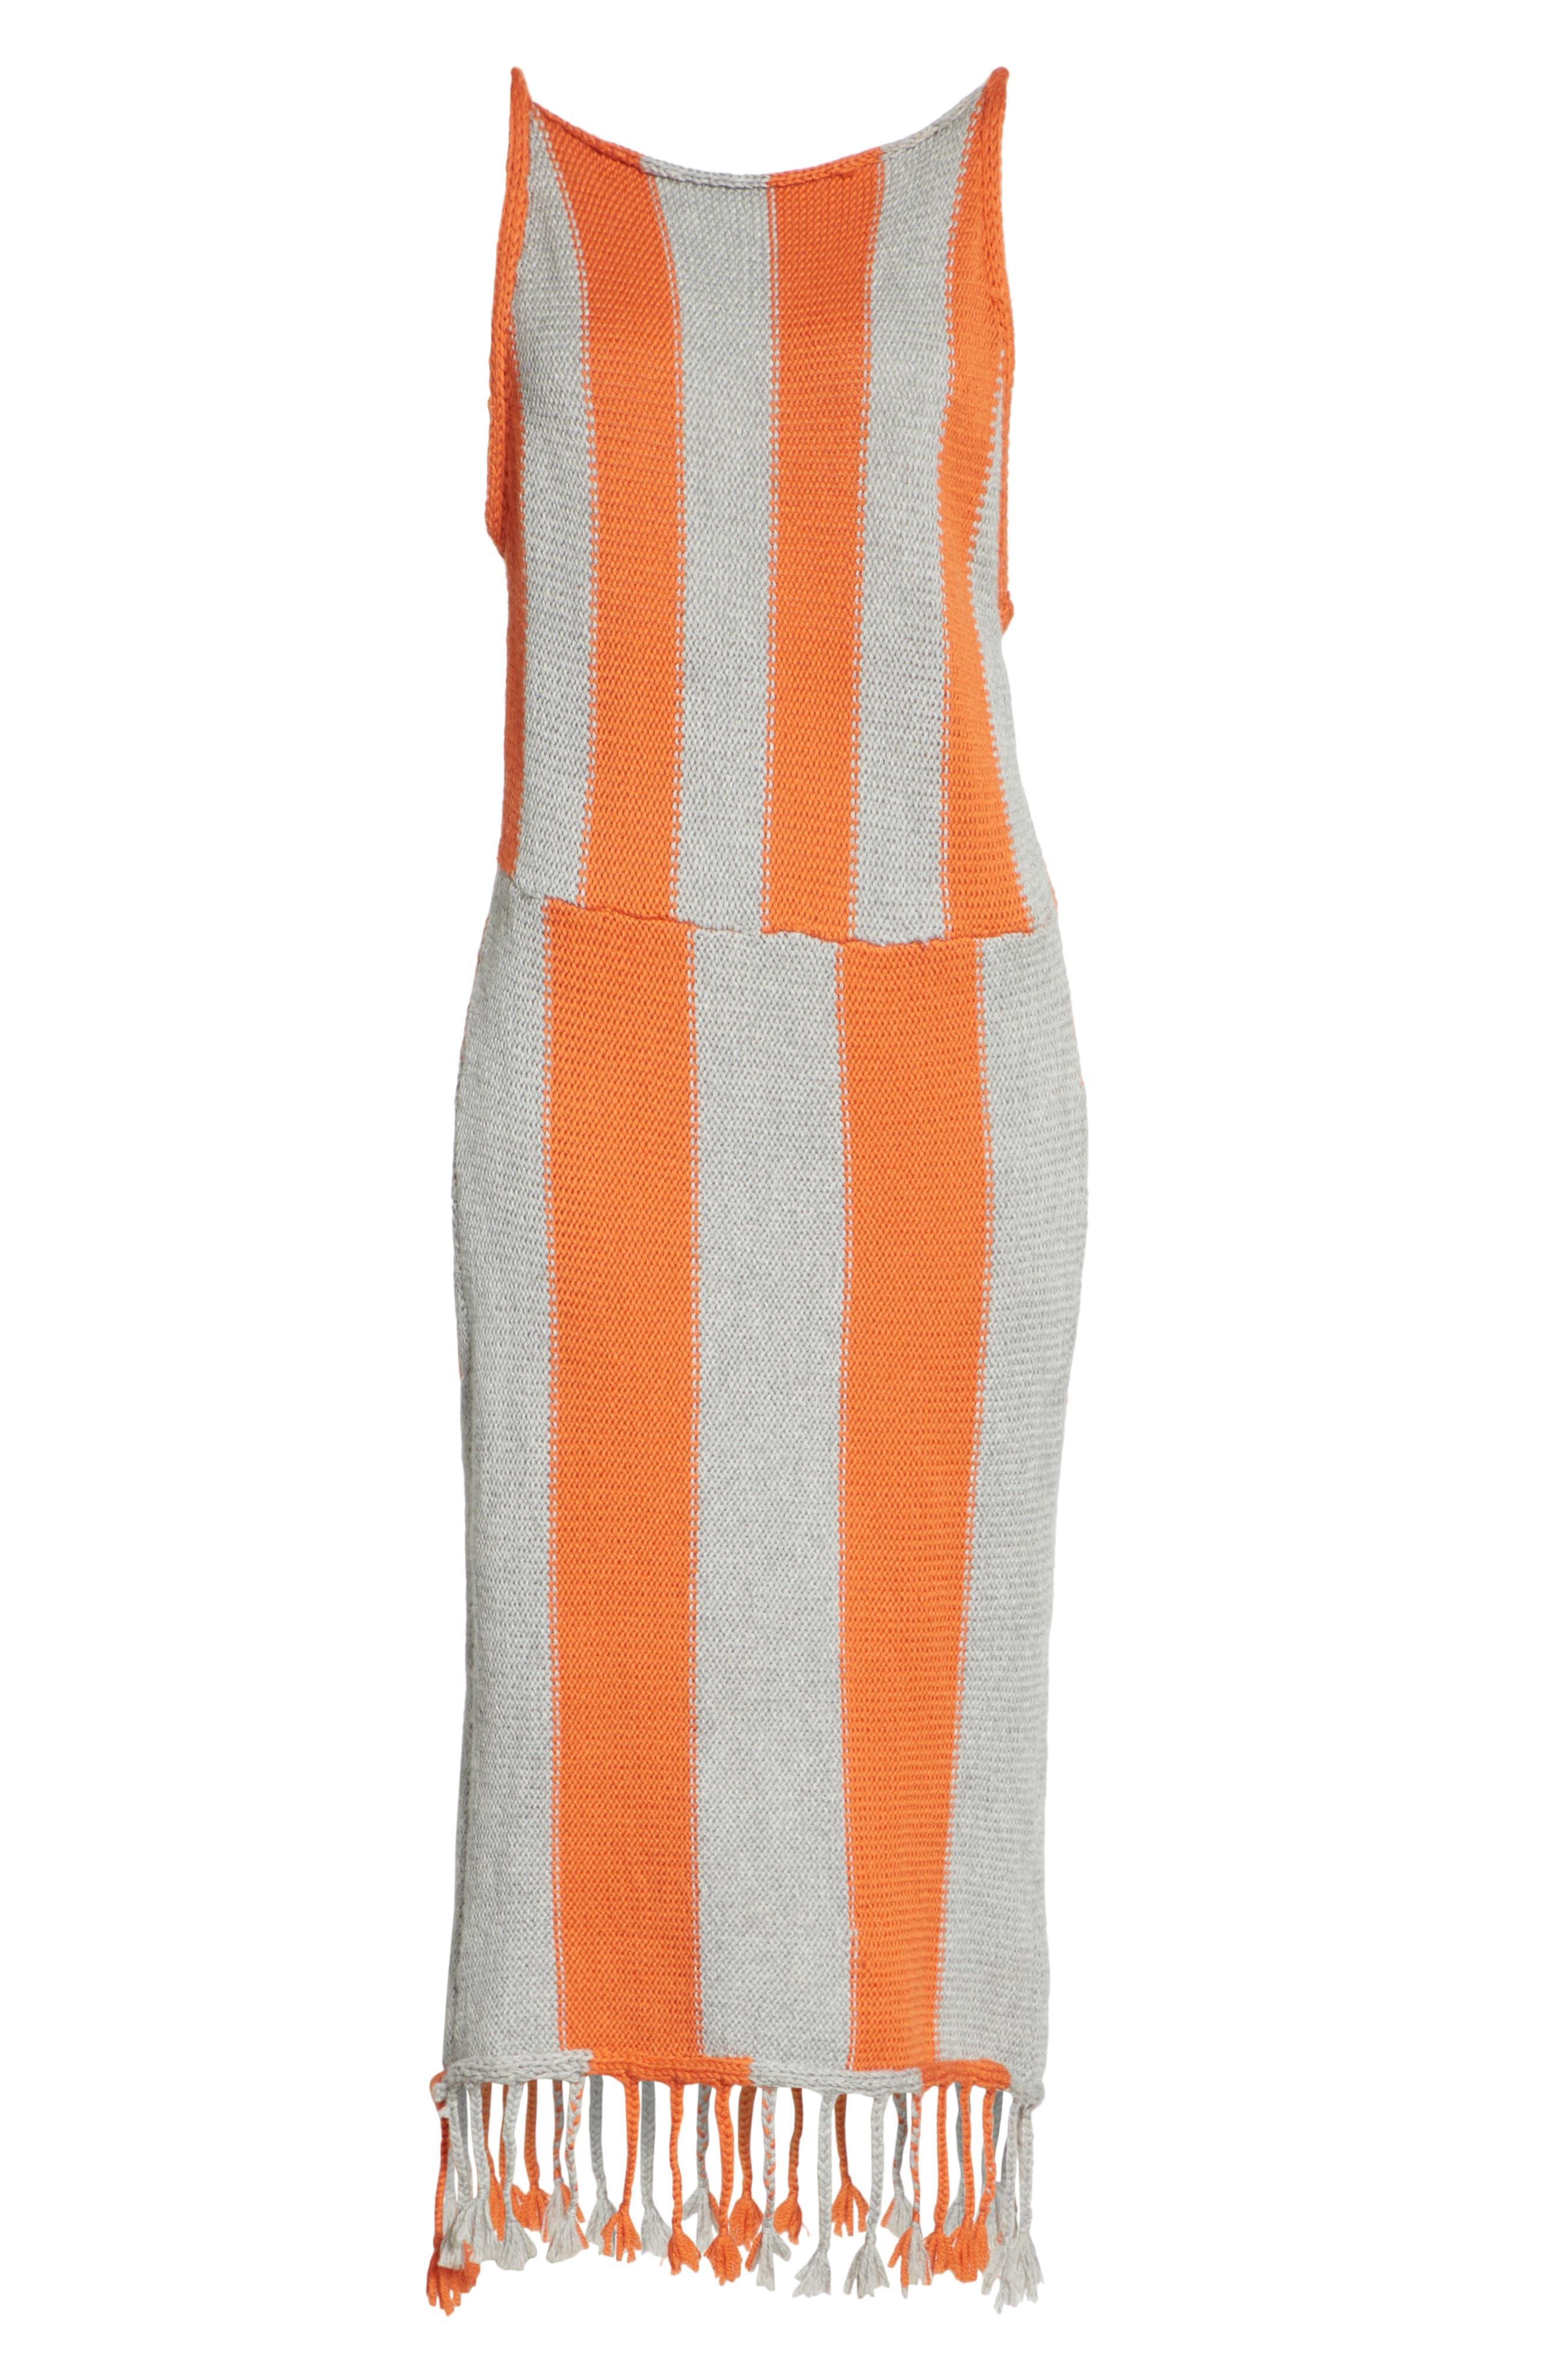 Stripe Tassel Hem Sweater Dress,                             Alternate thumbnail 7, color,                             GROG - GREY ORANGE